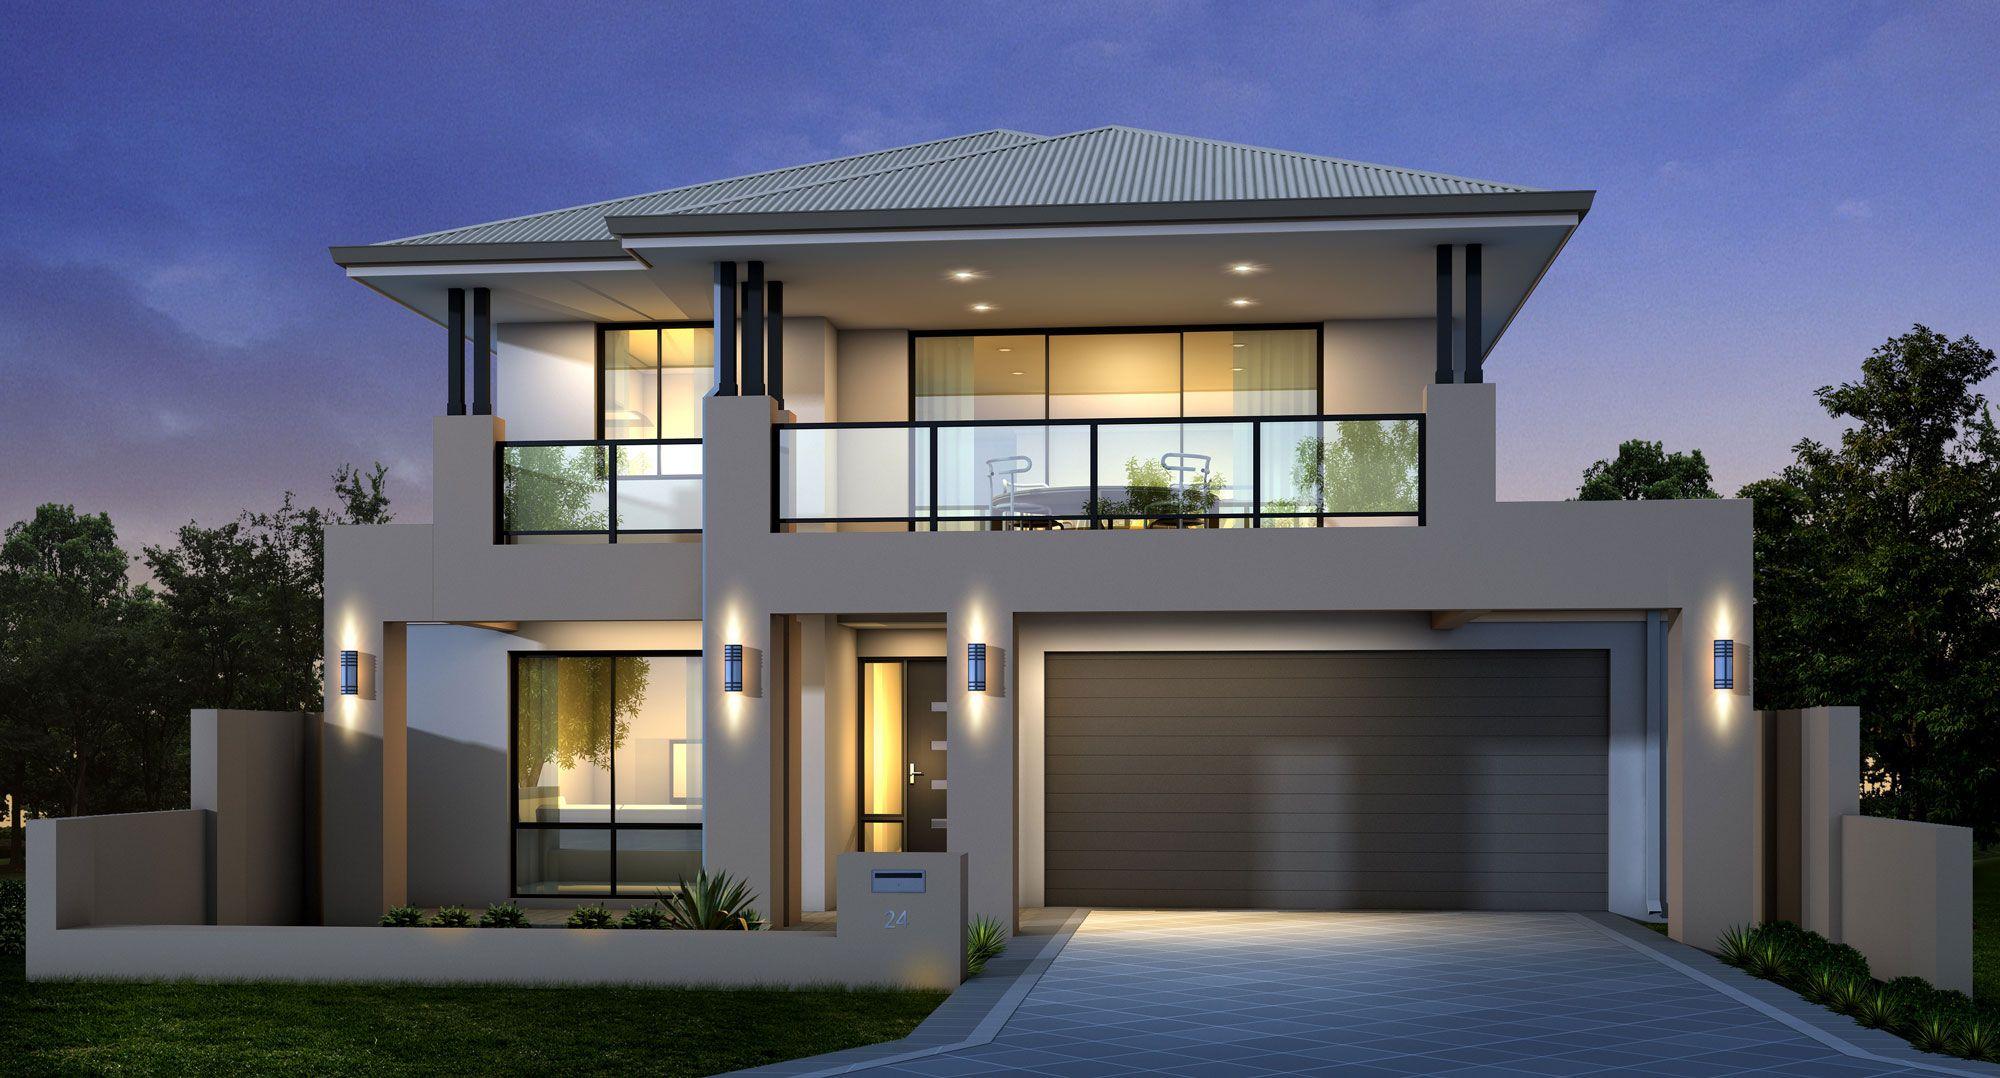 The Arkana Two Story Homes Mandurah Double Story Homes Two Story House Design 2 Storey House Design Facade House